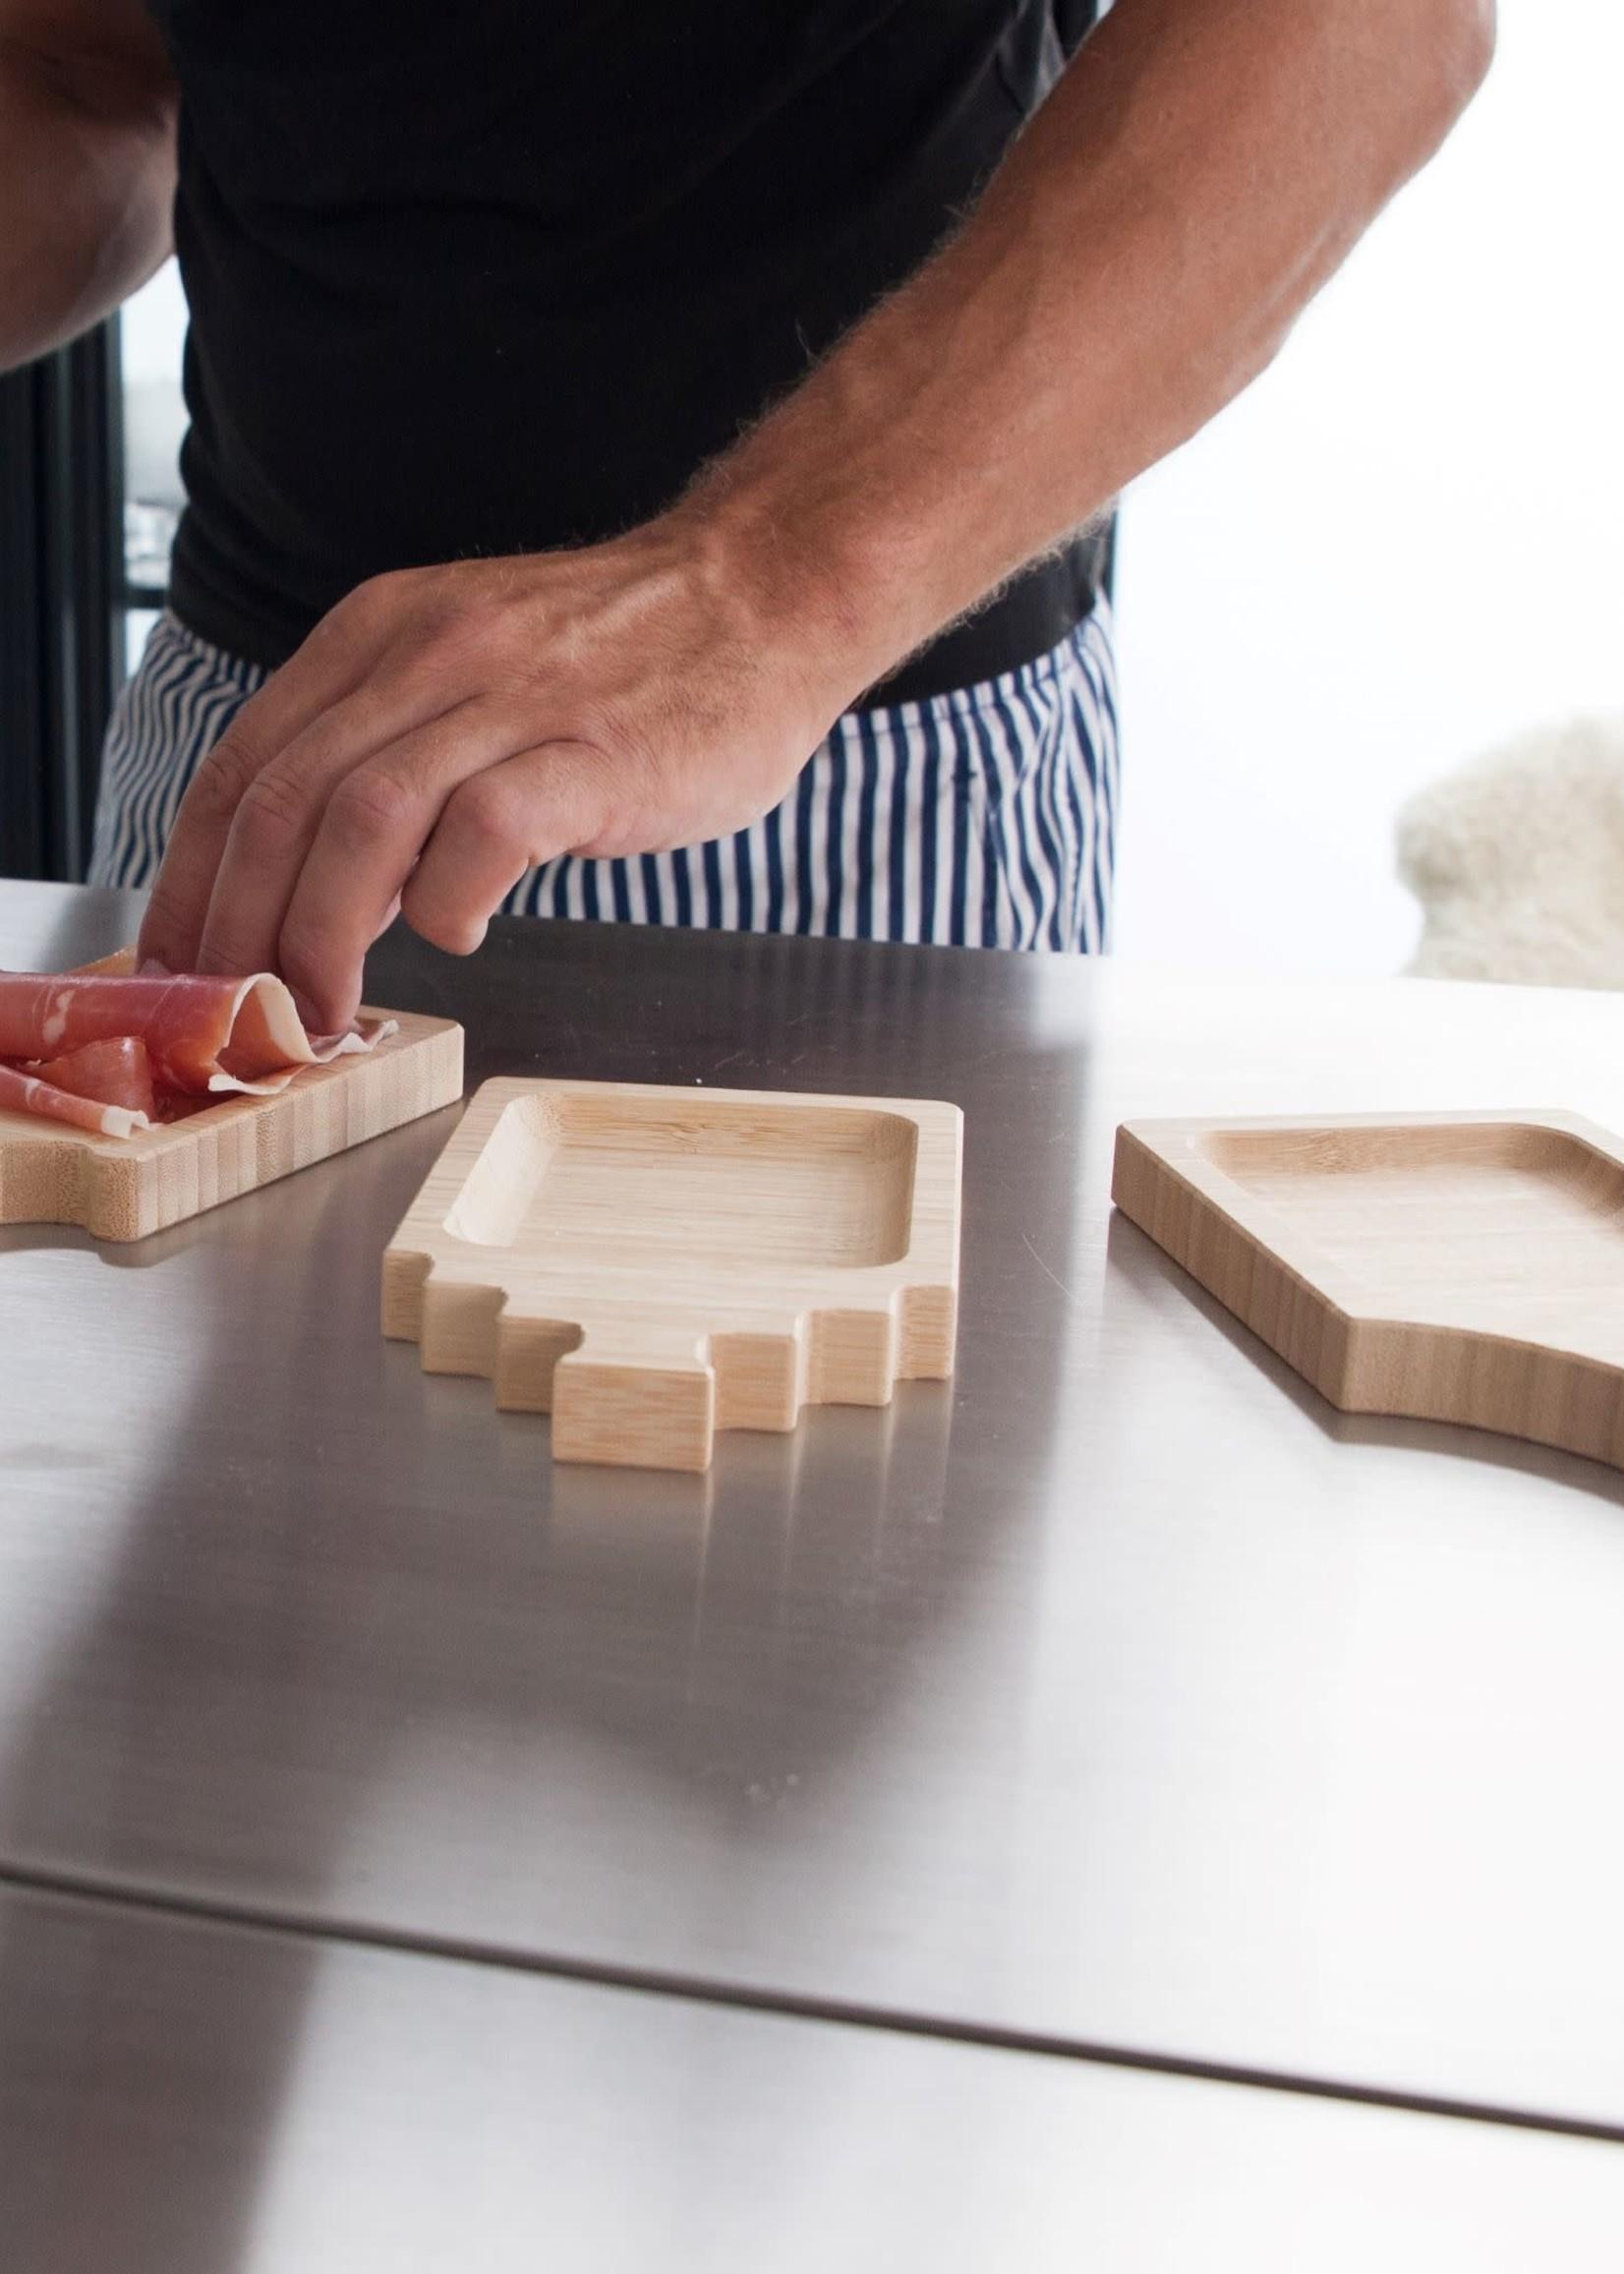 Woodlane Woodlane - Duurzame bamboe tapas plankjes -  Tapazz -3-Pack